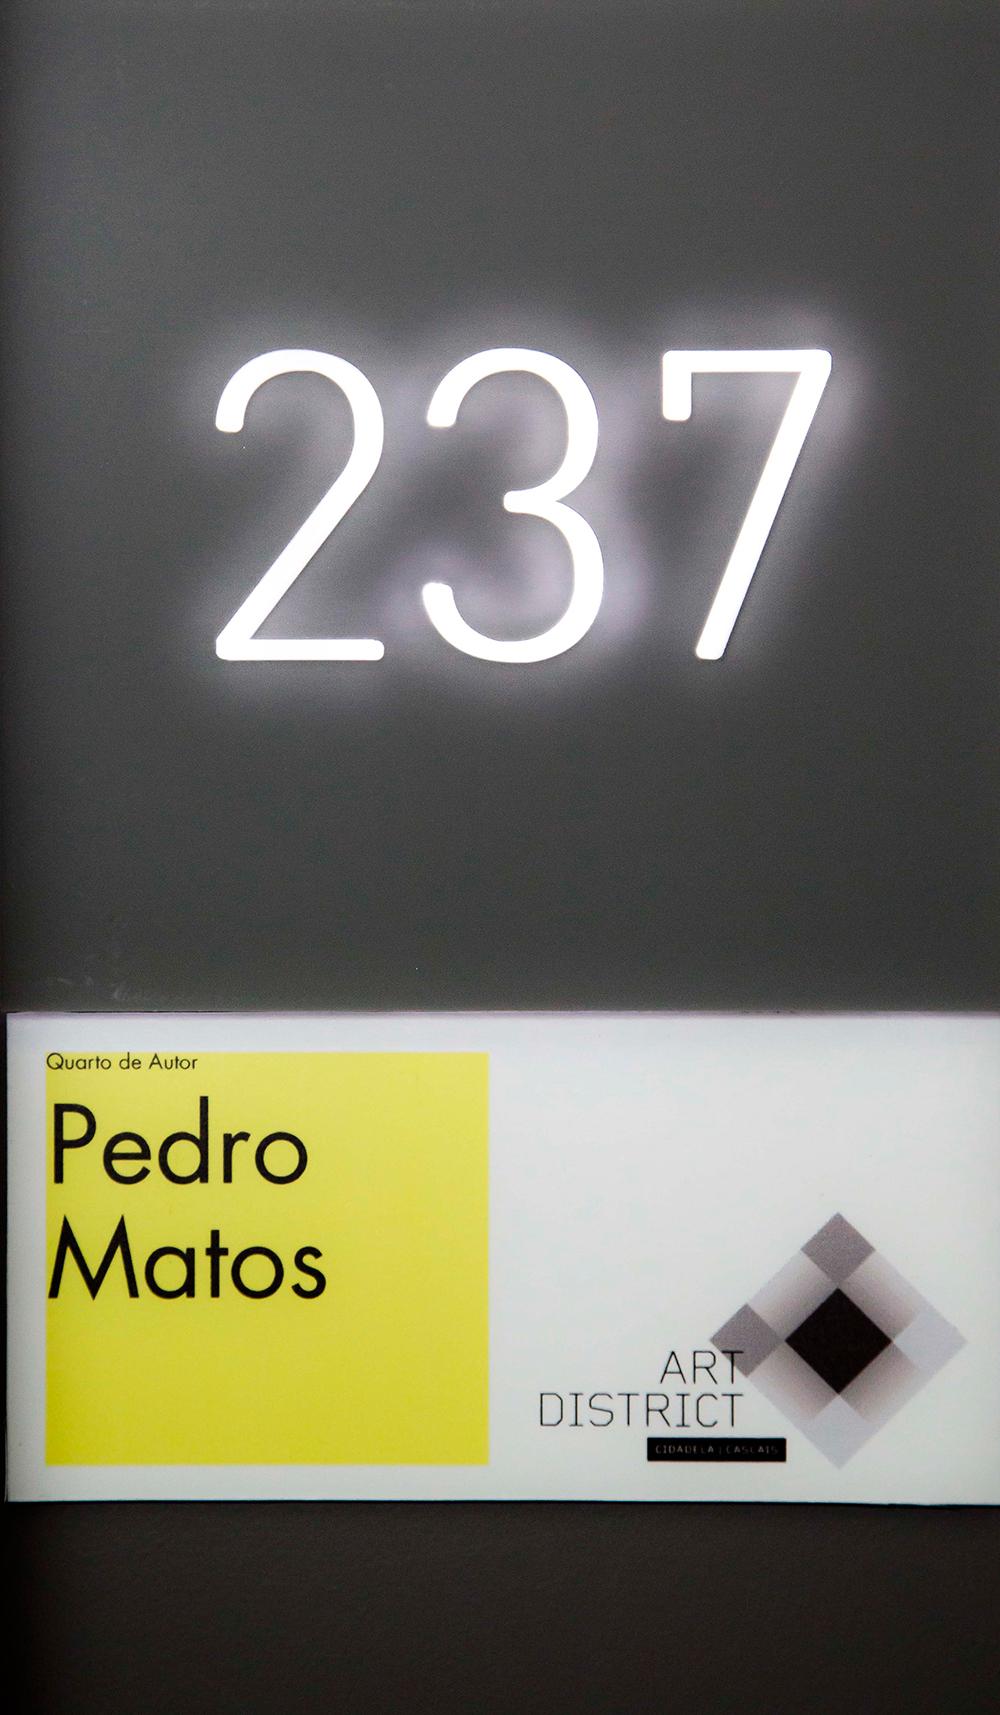 Pousada-Takeover---Quarto-237---Pedro-Matos.jpg